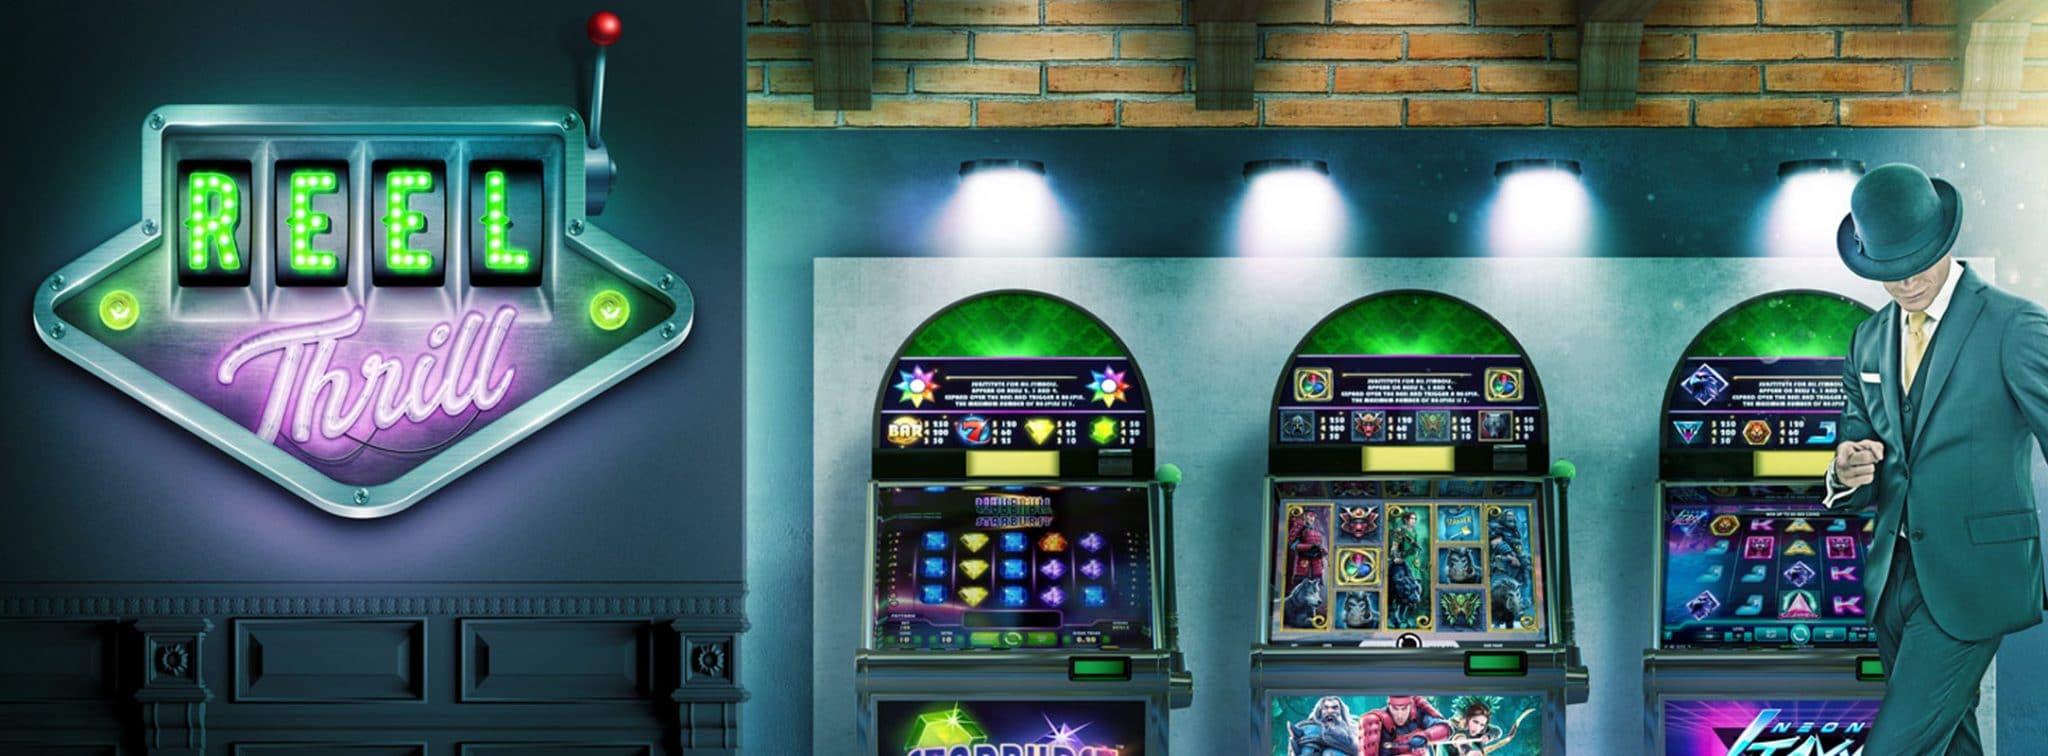 Bonus Spins are Falling at Mr Green Casino element01 - CasinoTop